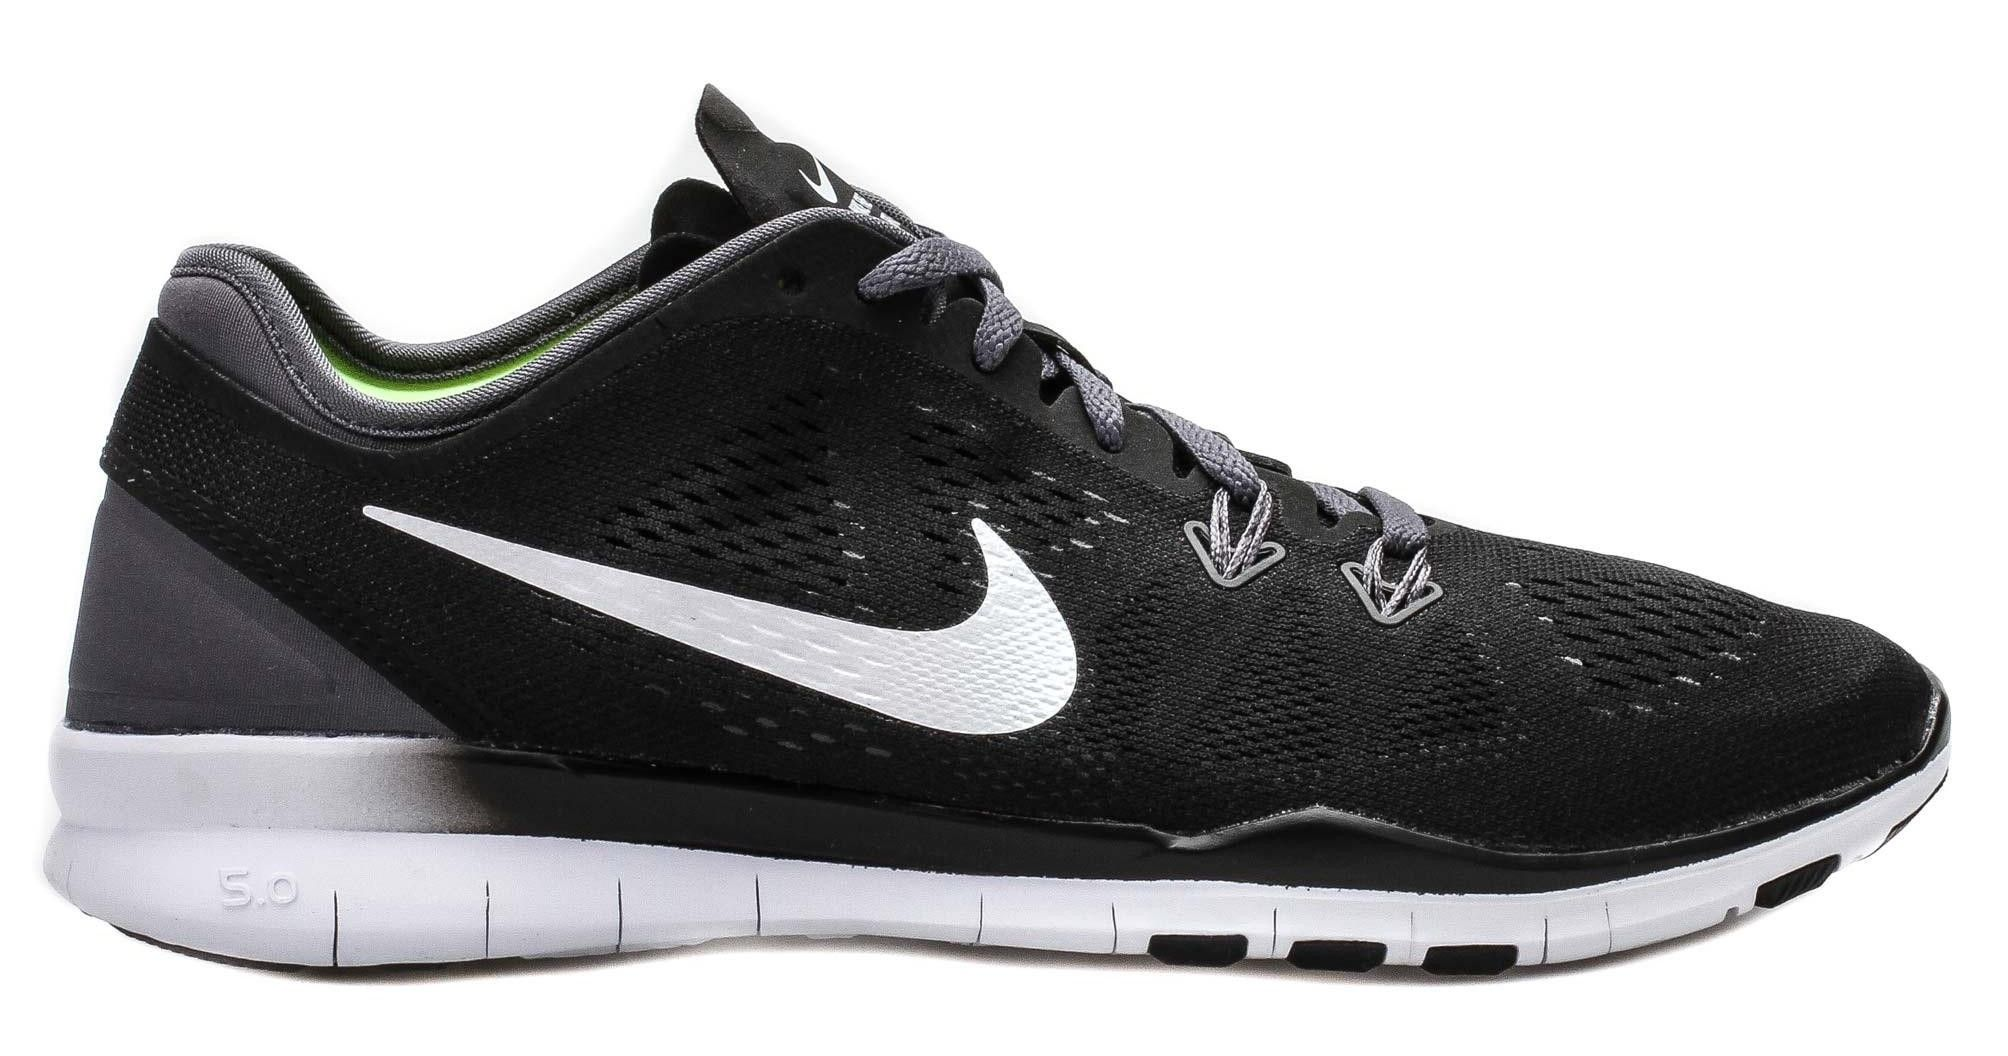 16a6fd525470 Nike Roshe Run custom design  Rosherun  Mens and Womens sizes ...